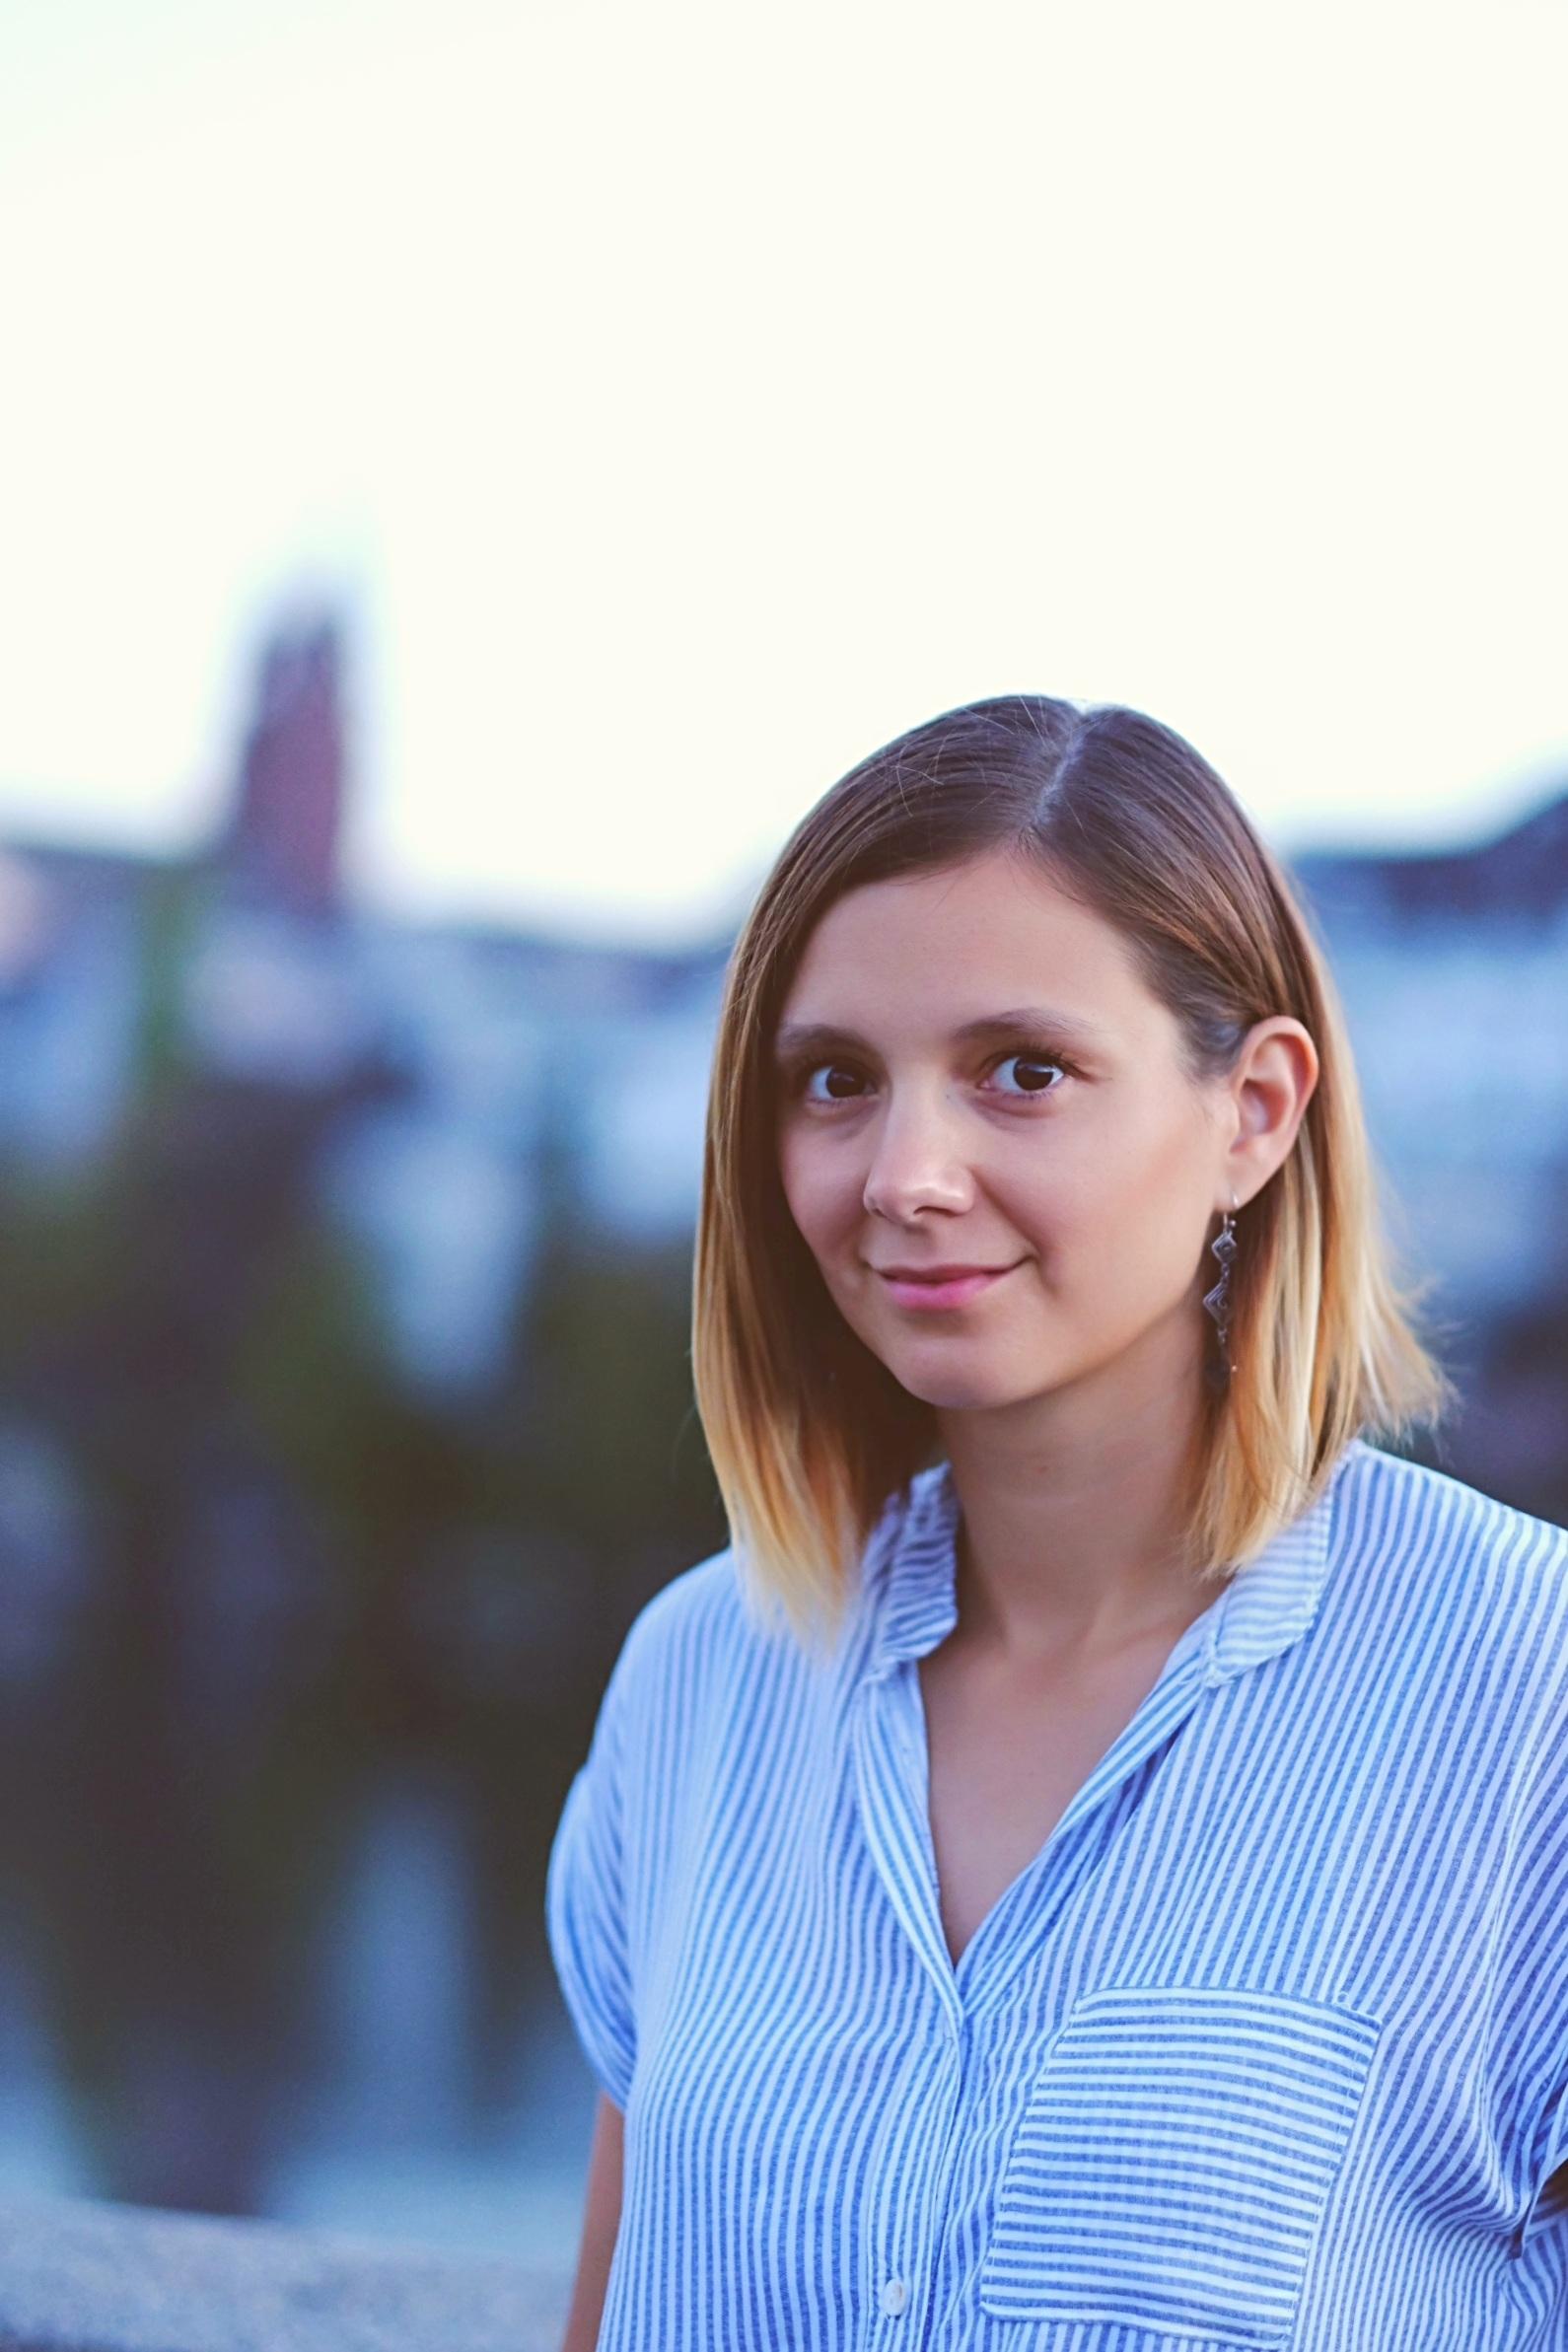 PortraitPicture_Veronika+%281%29.jpg